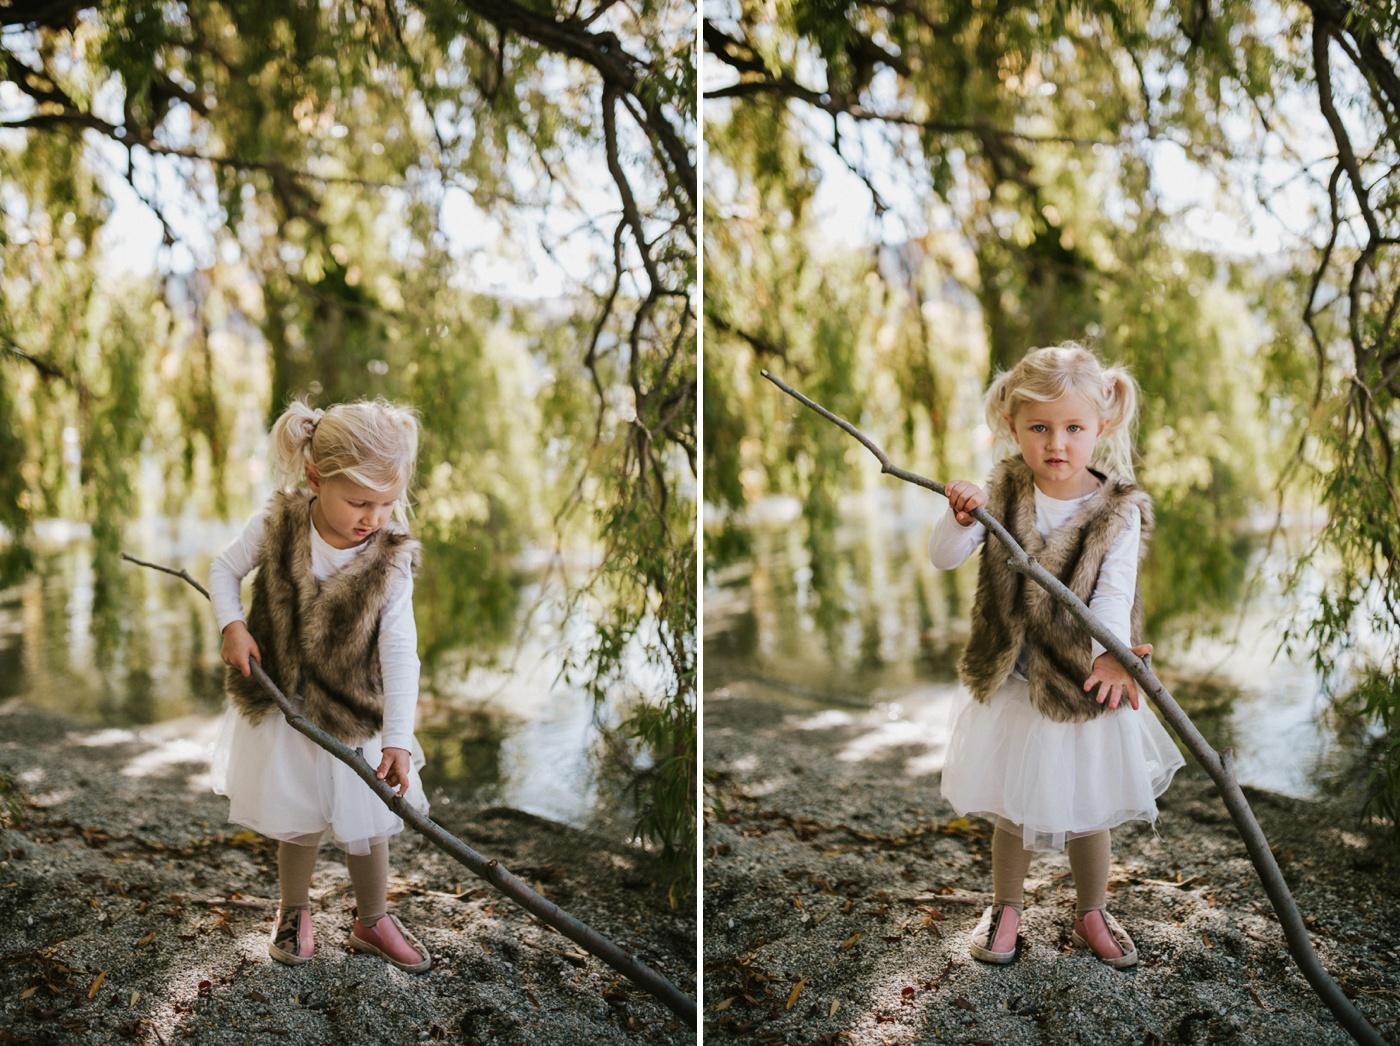 Blake-Lily-Rolig-Lekfull-Familjesession-Familjefotograf-Stockholm-Orebro_02